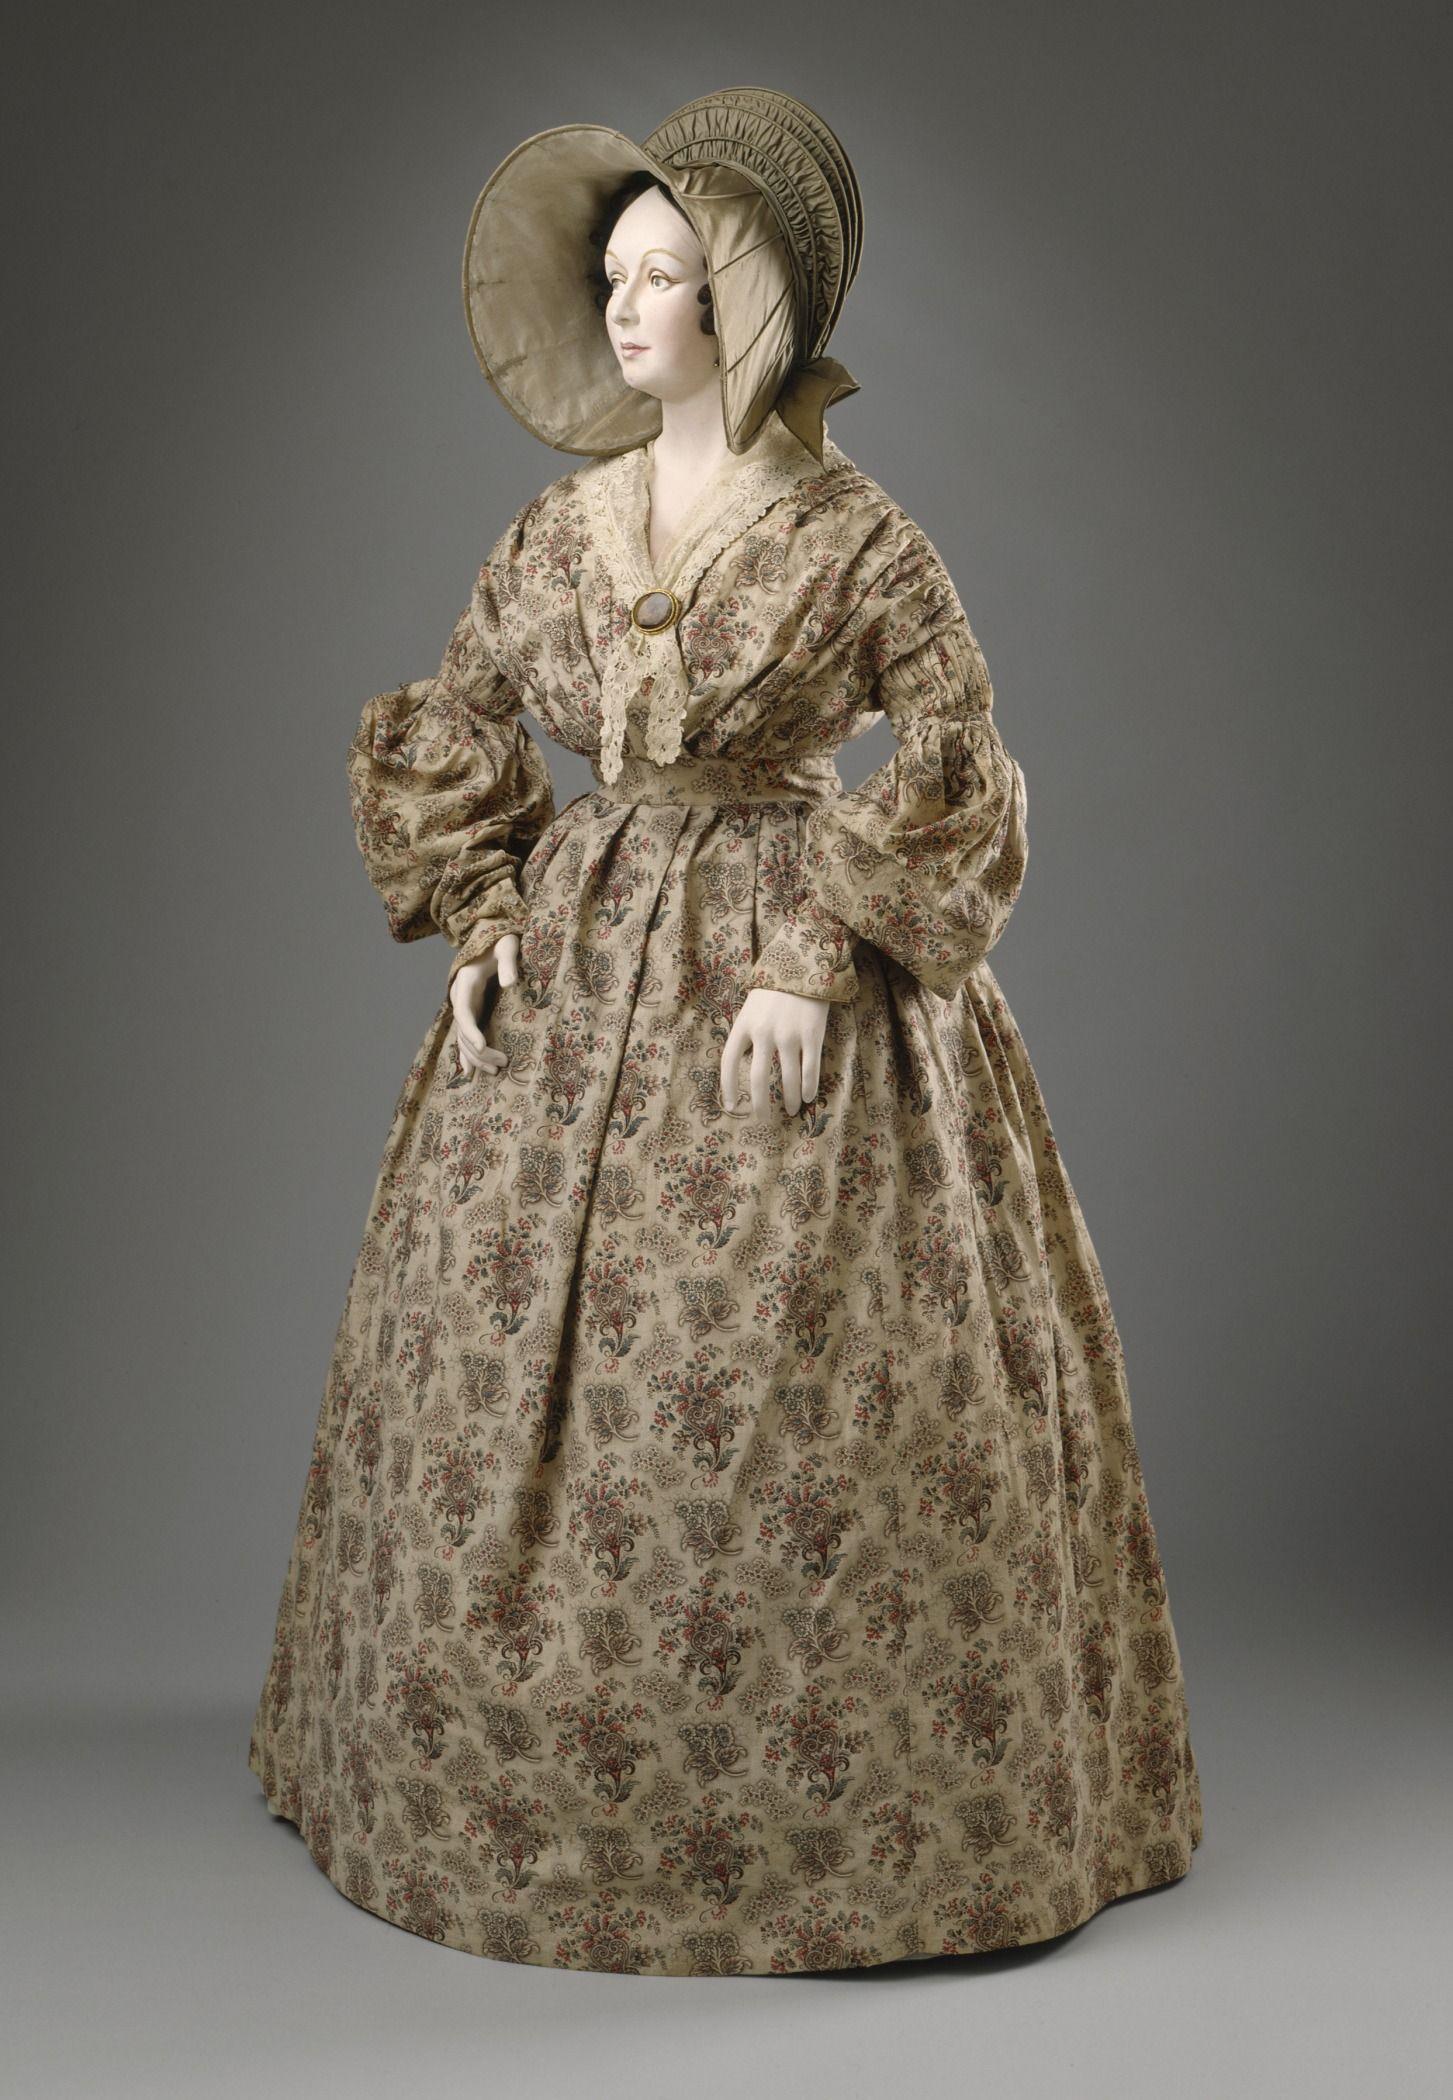 Dress: ca. 1836-1837, English, roller-printed cotton calico.